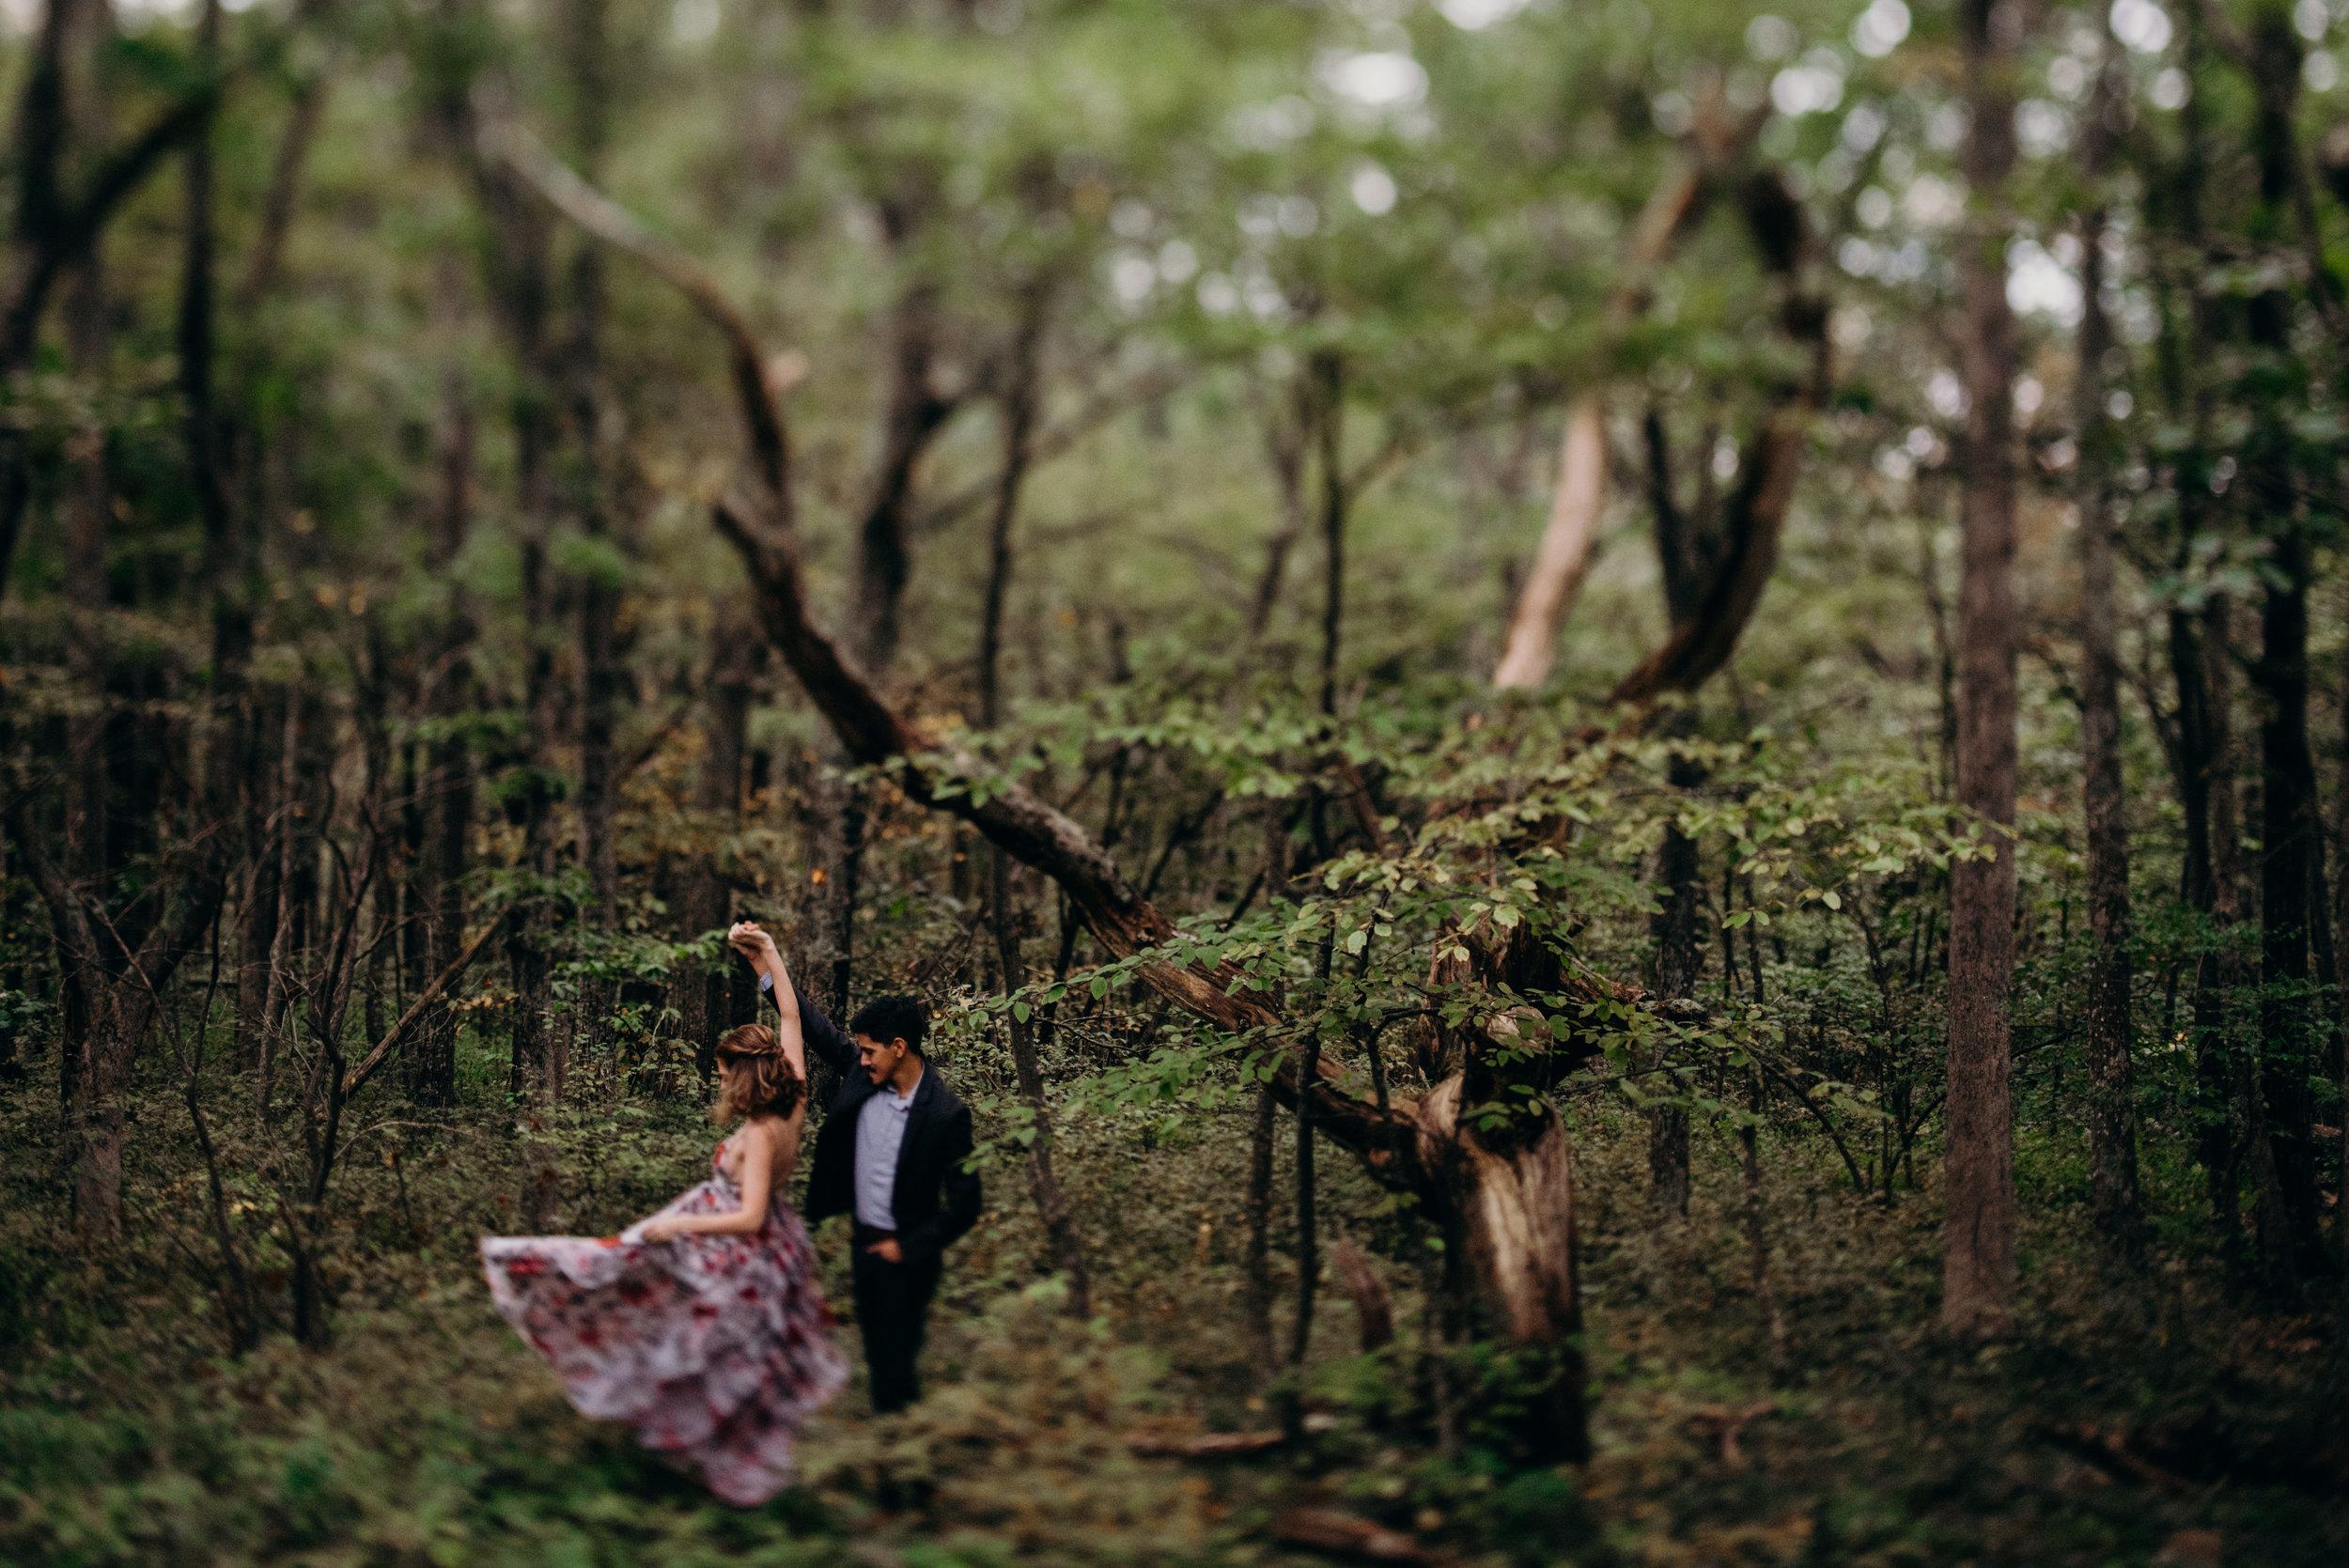 alvaro-sasha-skyline-drive-engagement-session-virginia-wedding-photographer-lindsey-paradiso-8723.jpg